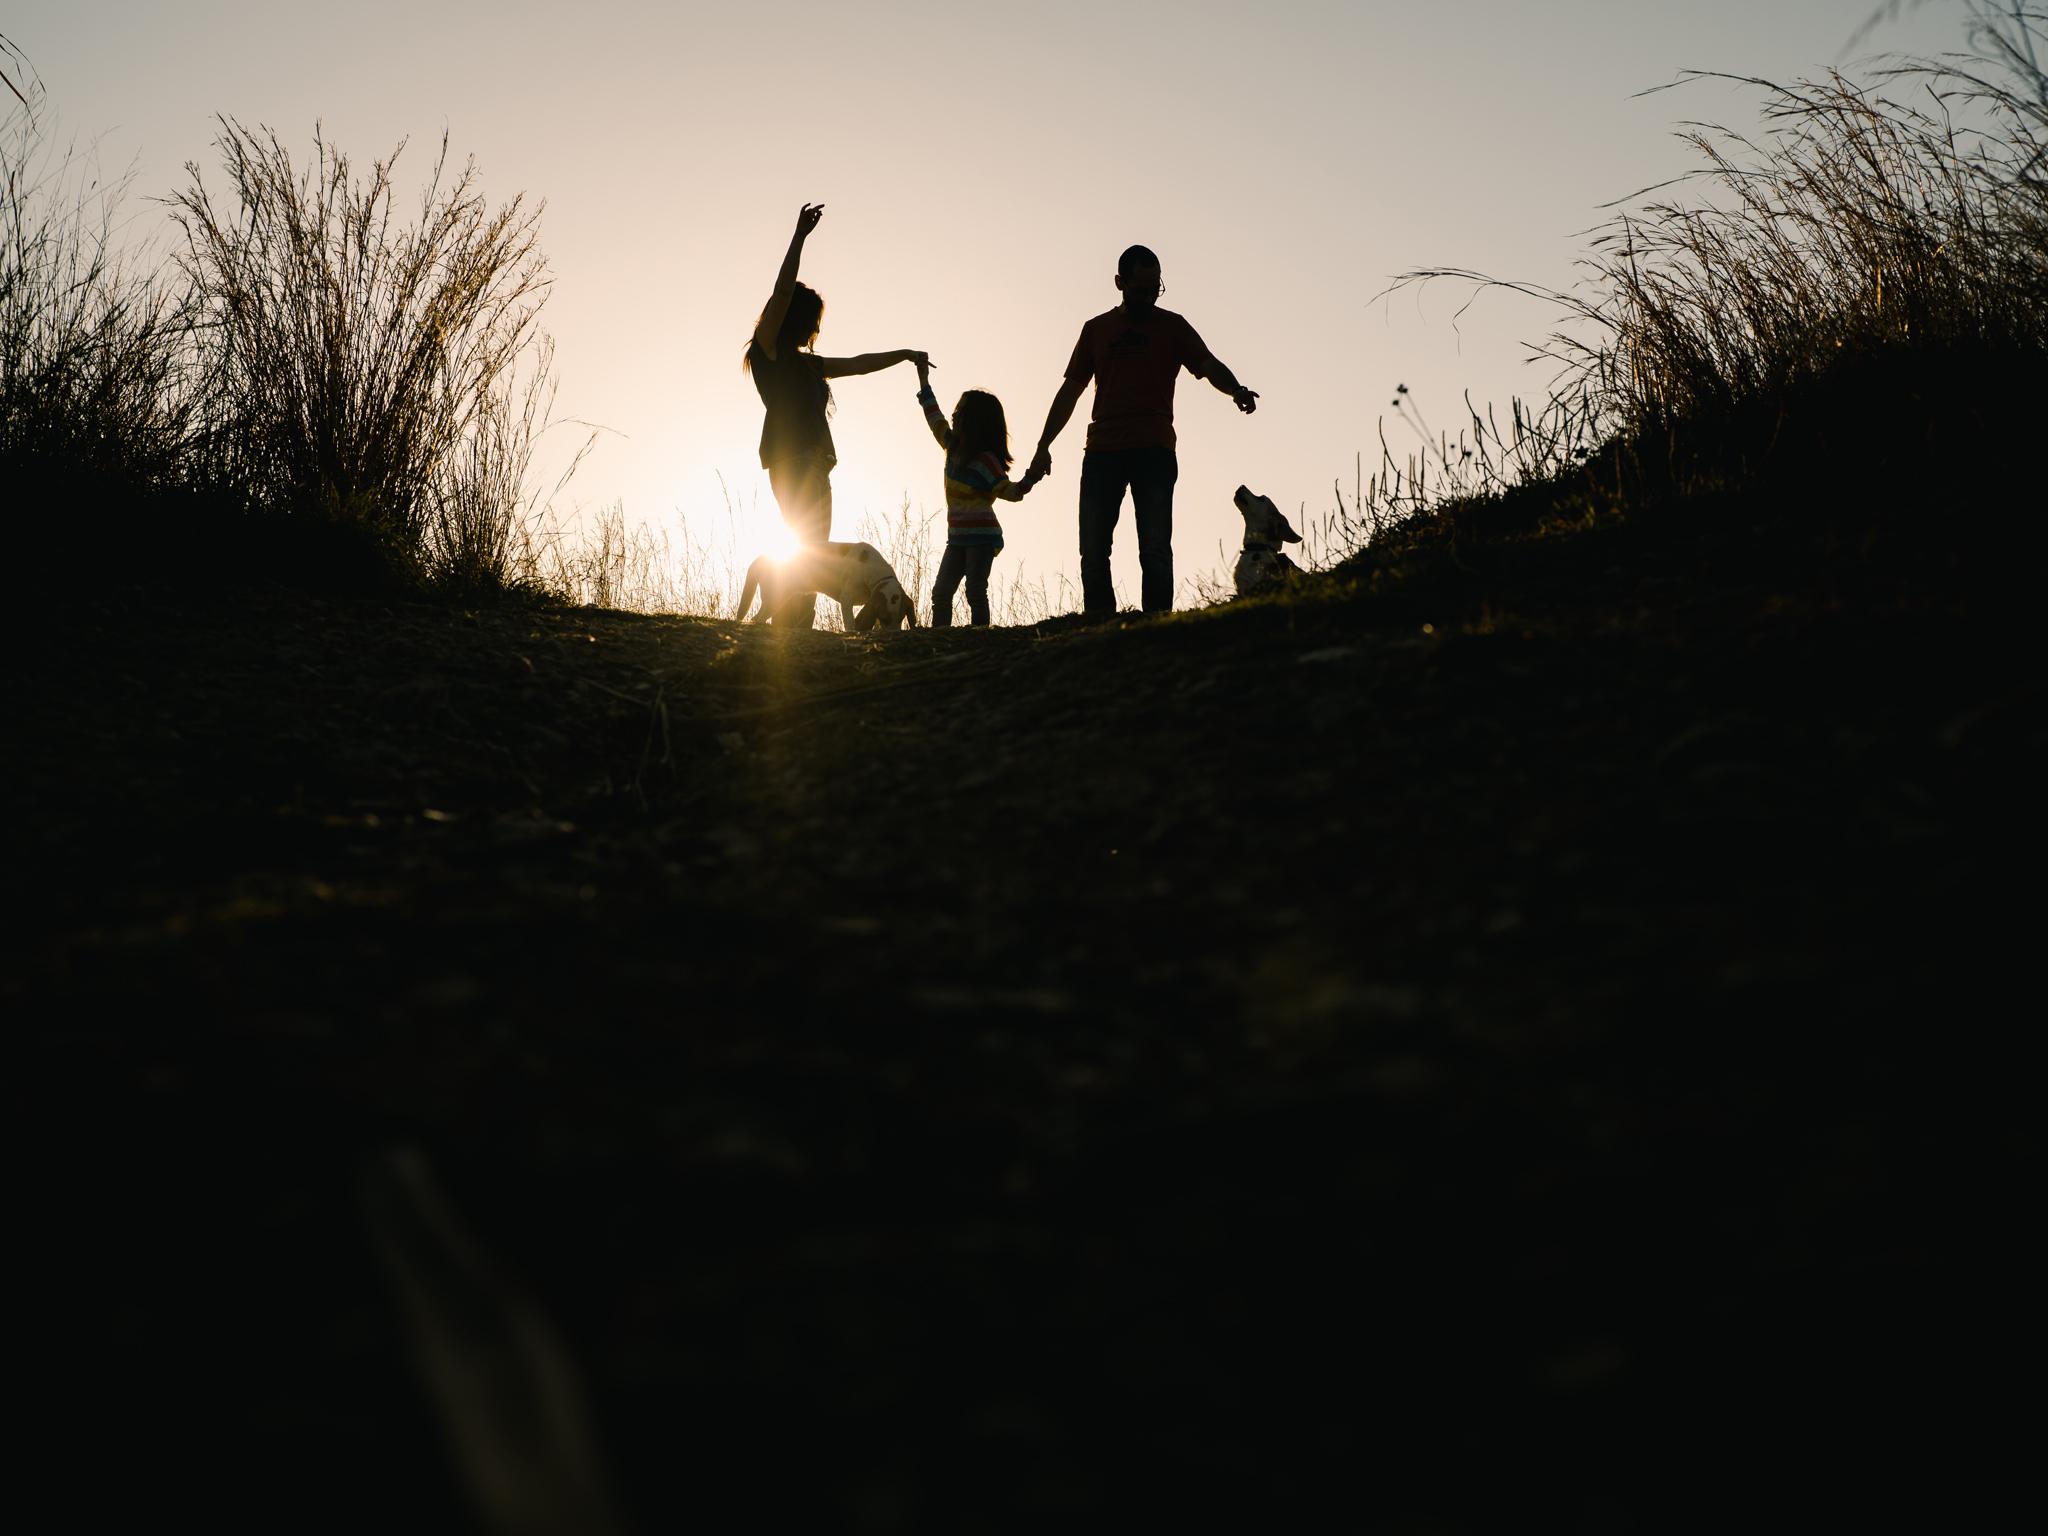 fotografia-infantil-familiar10.jpg